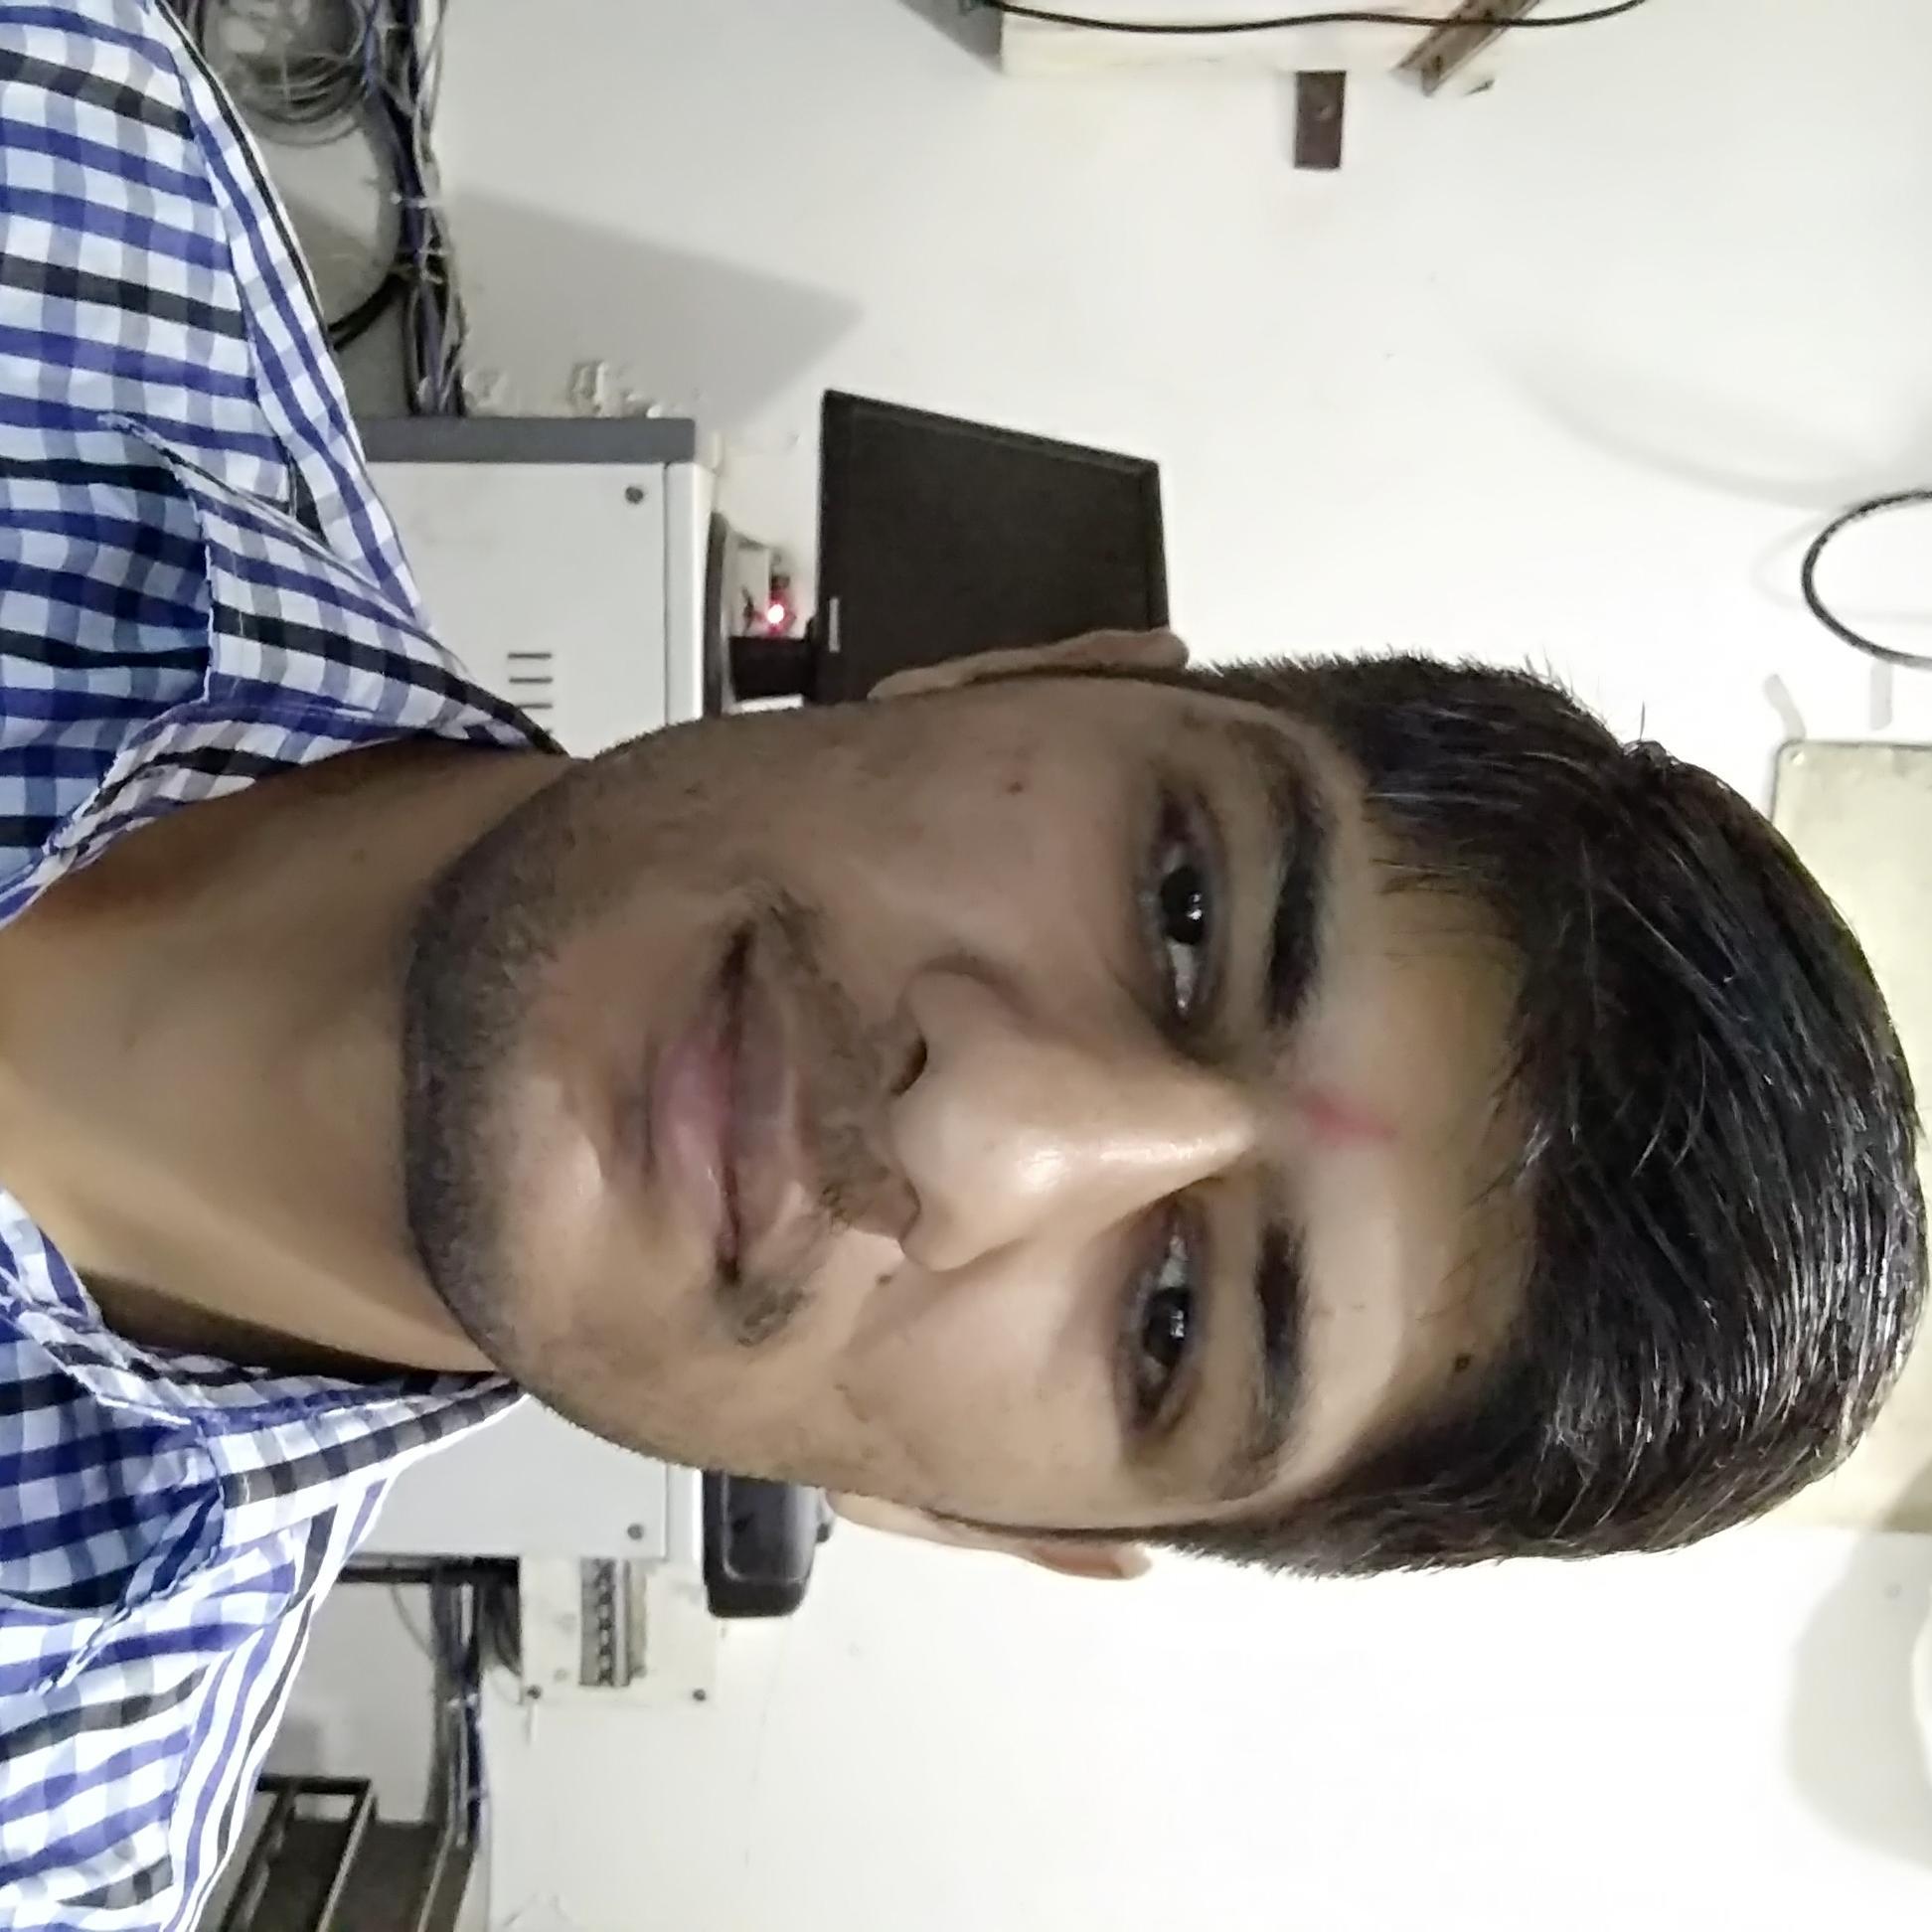 RavinderSangwan